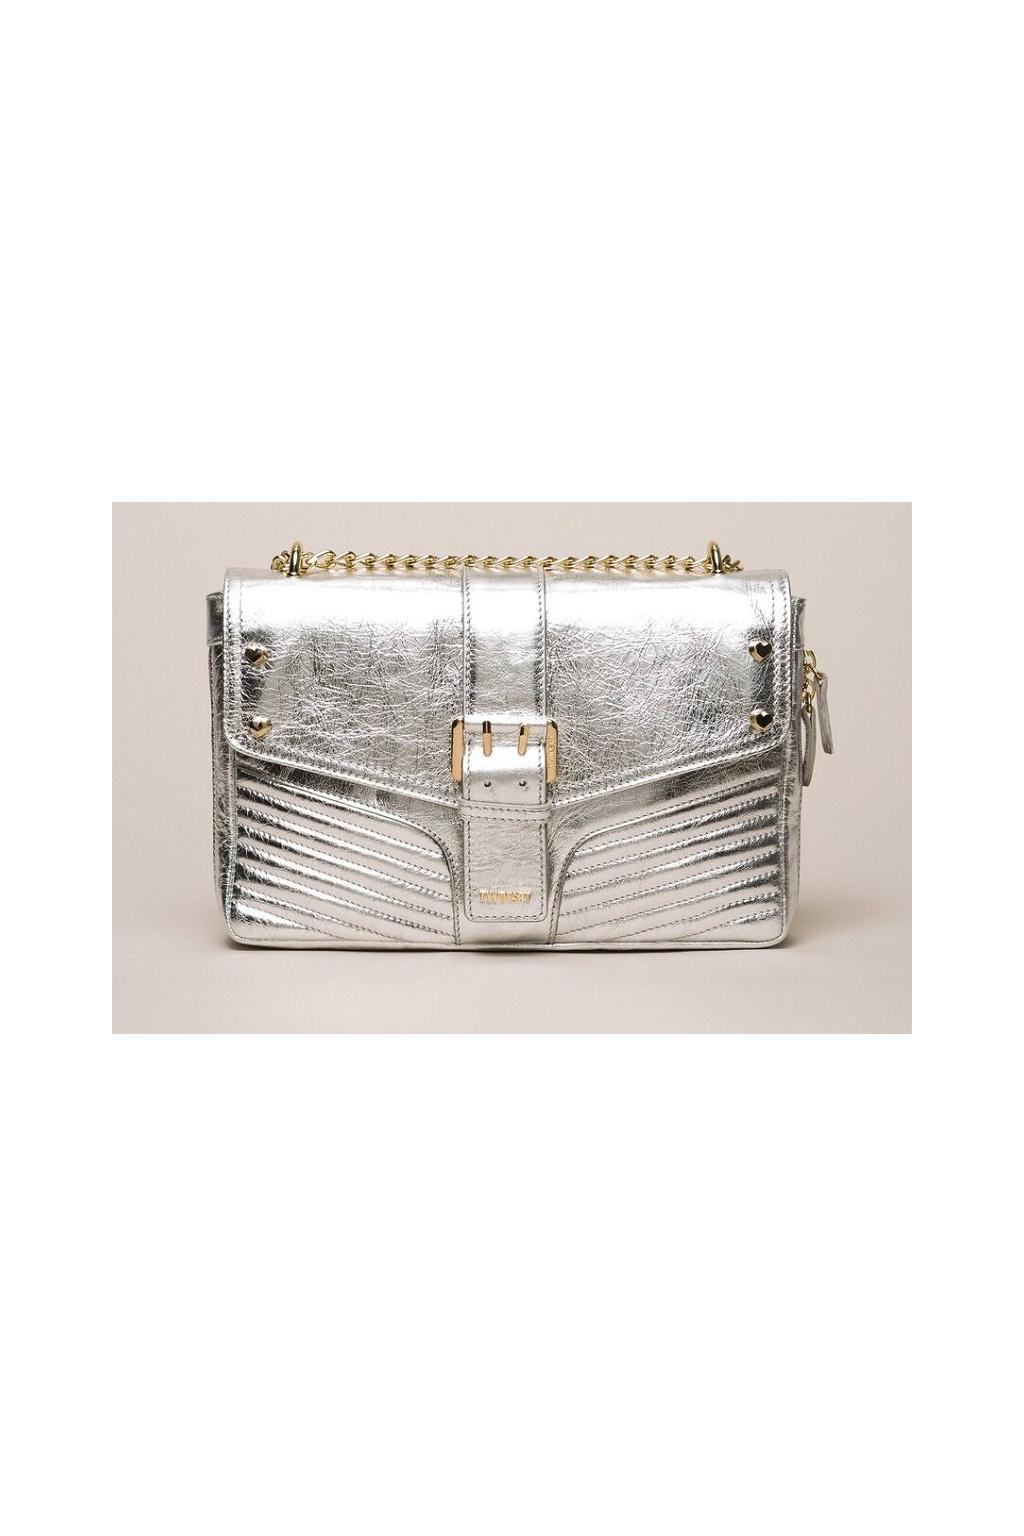 999TA7233 Dámská kabelka Twinset stříbrná